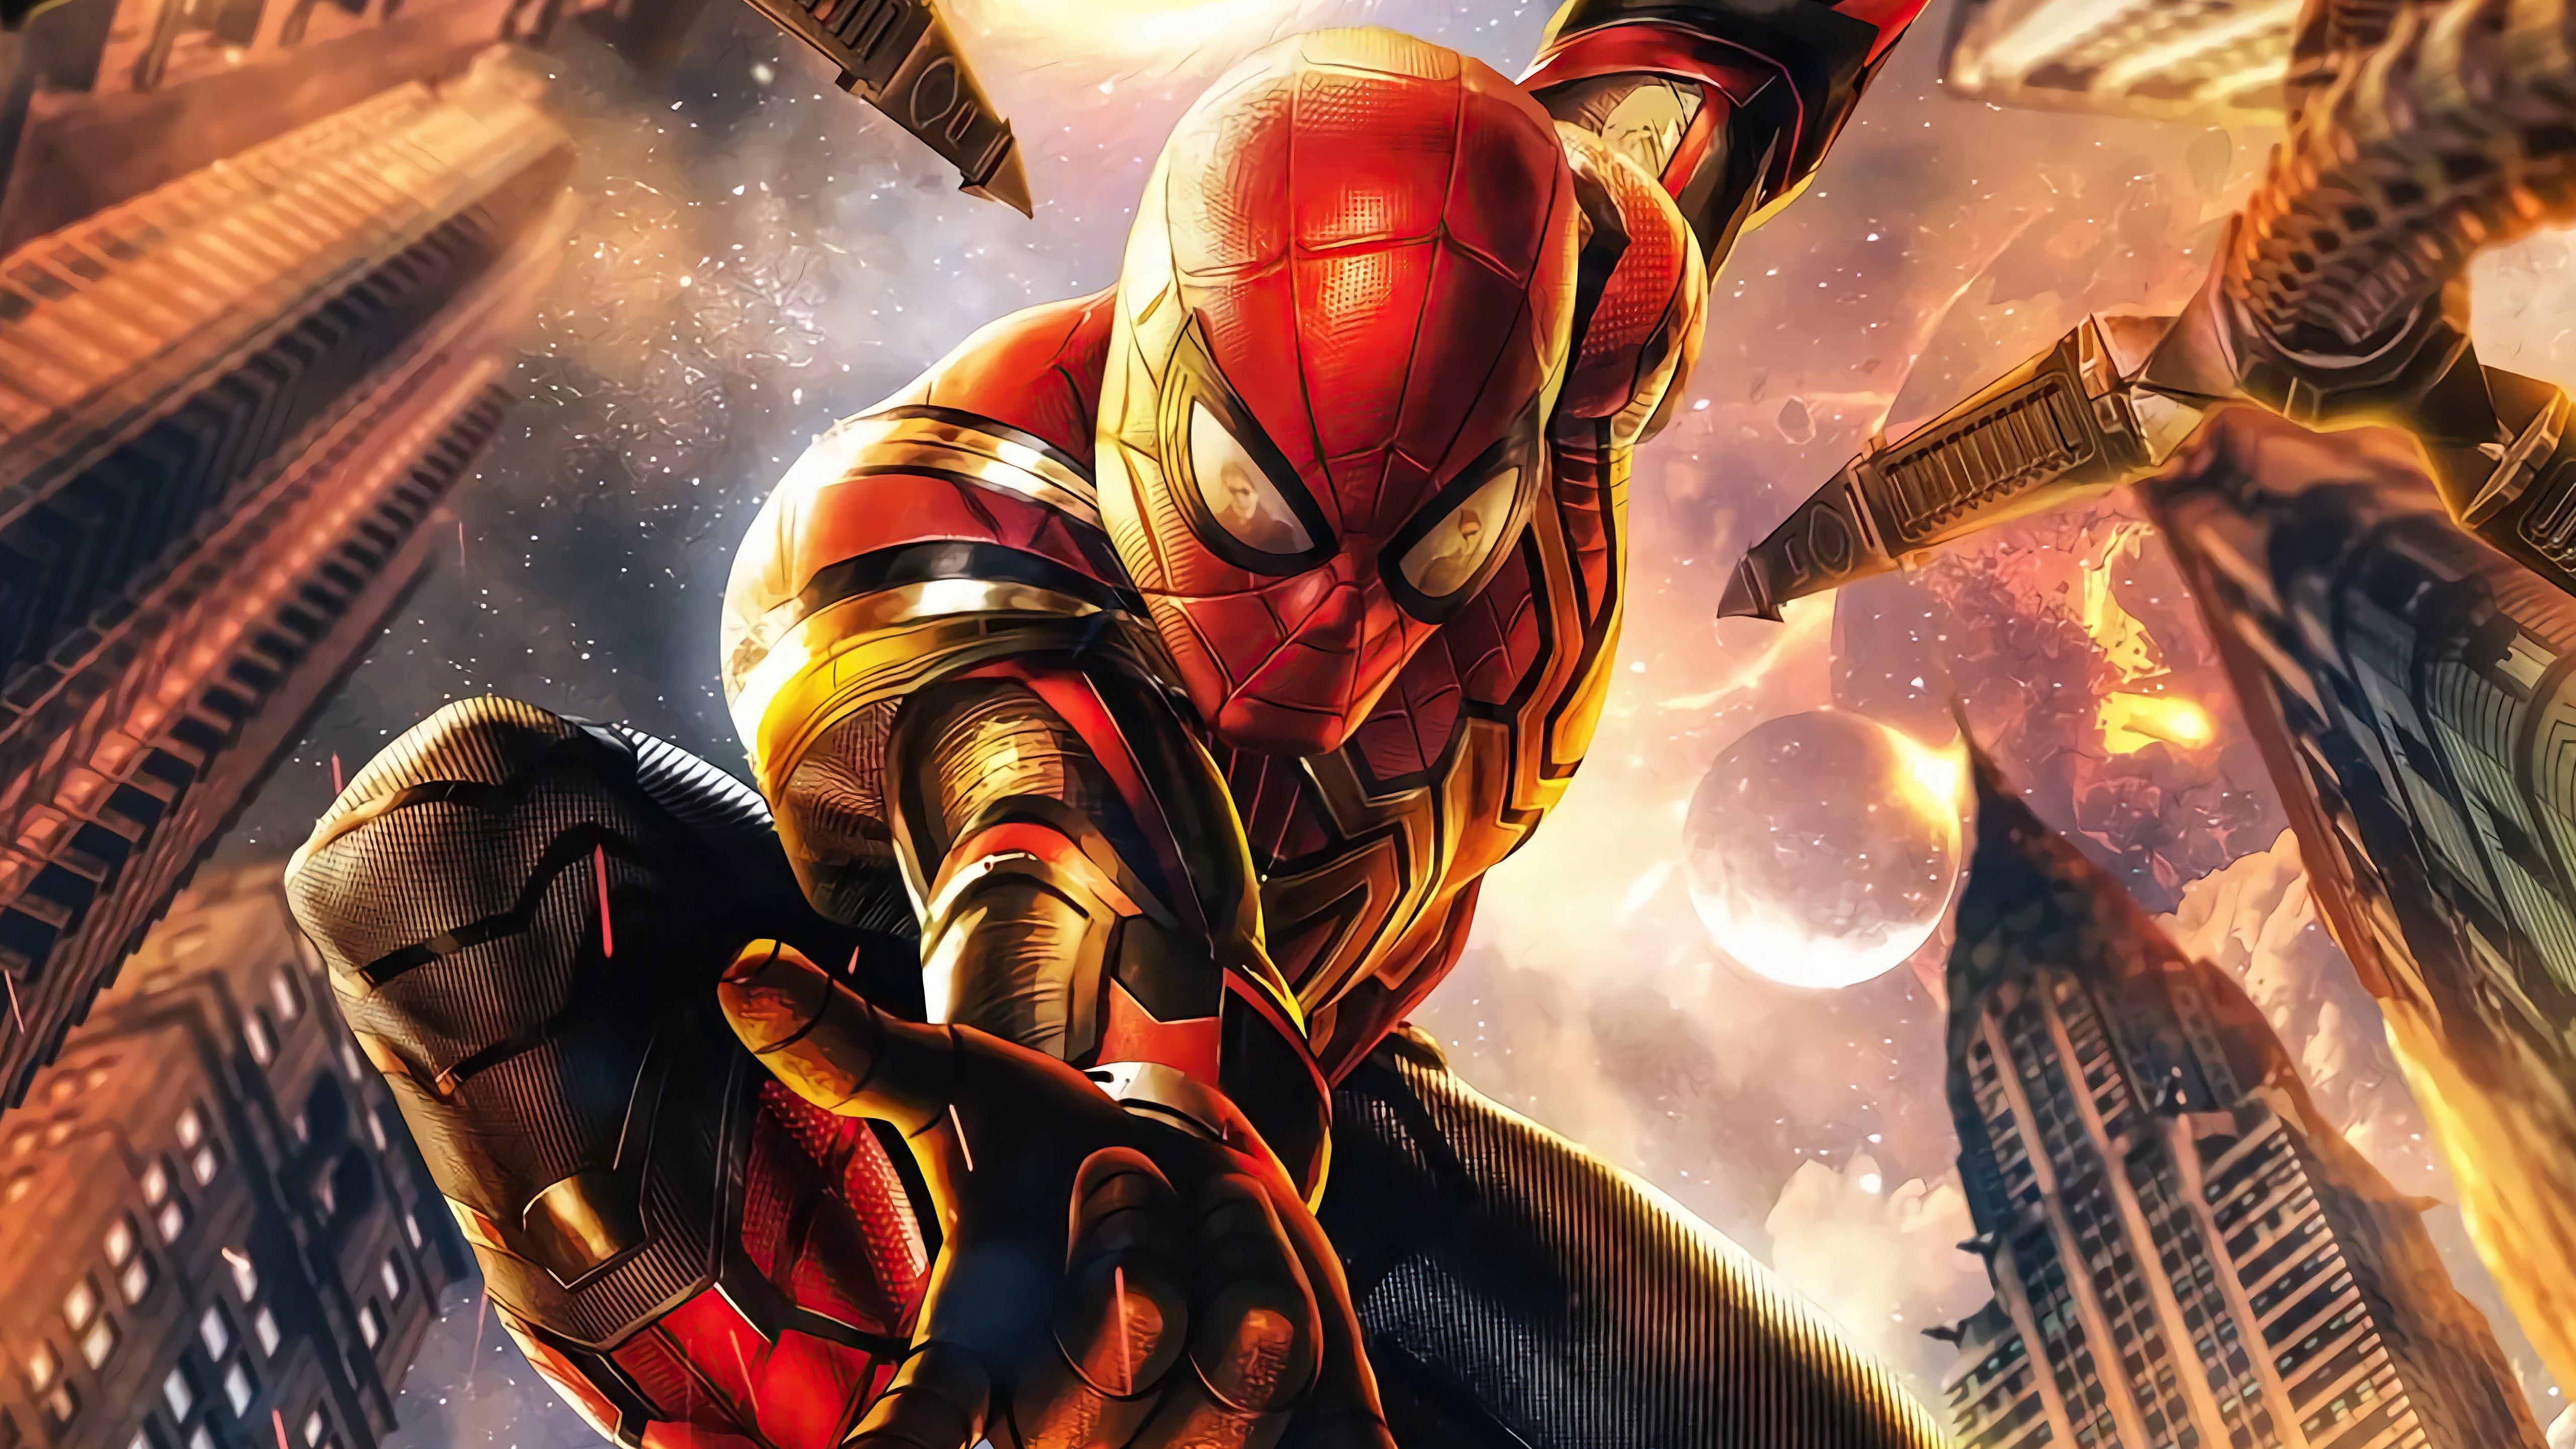 Wallpaper Spider Man No way home